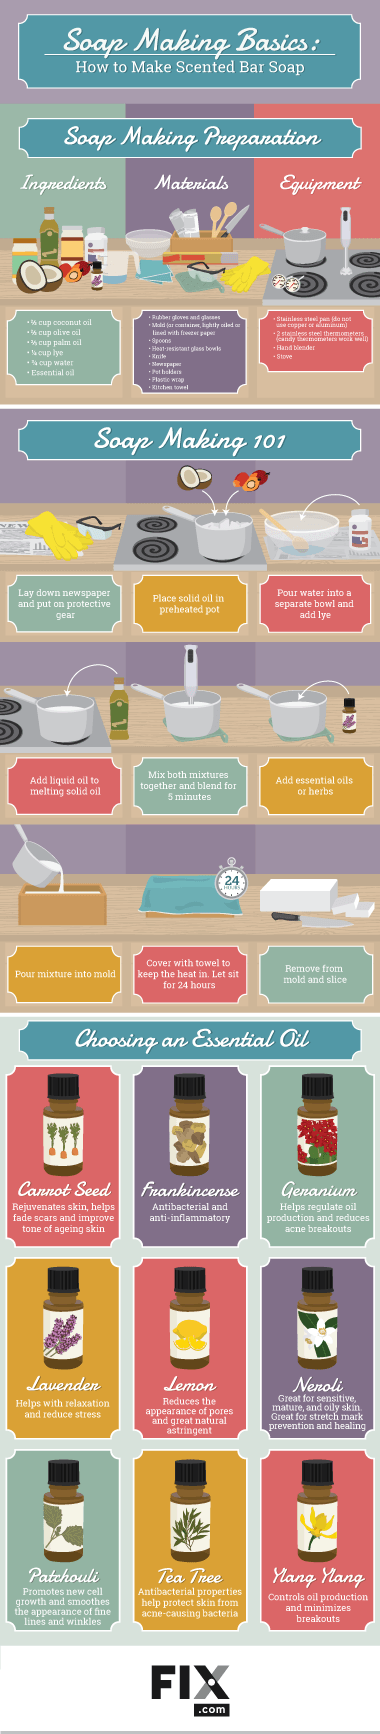 soap making basics